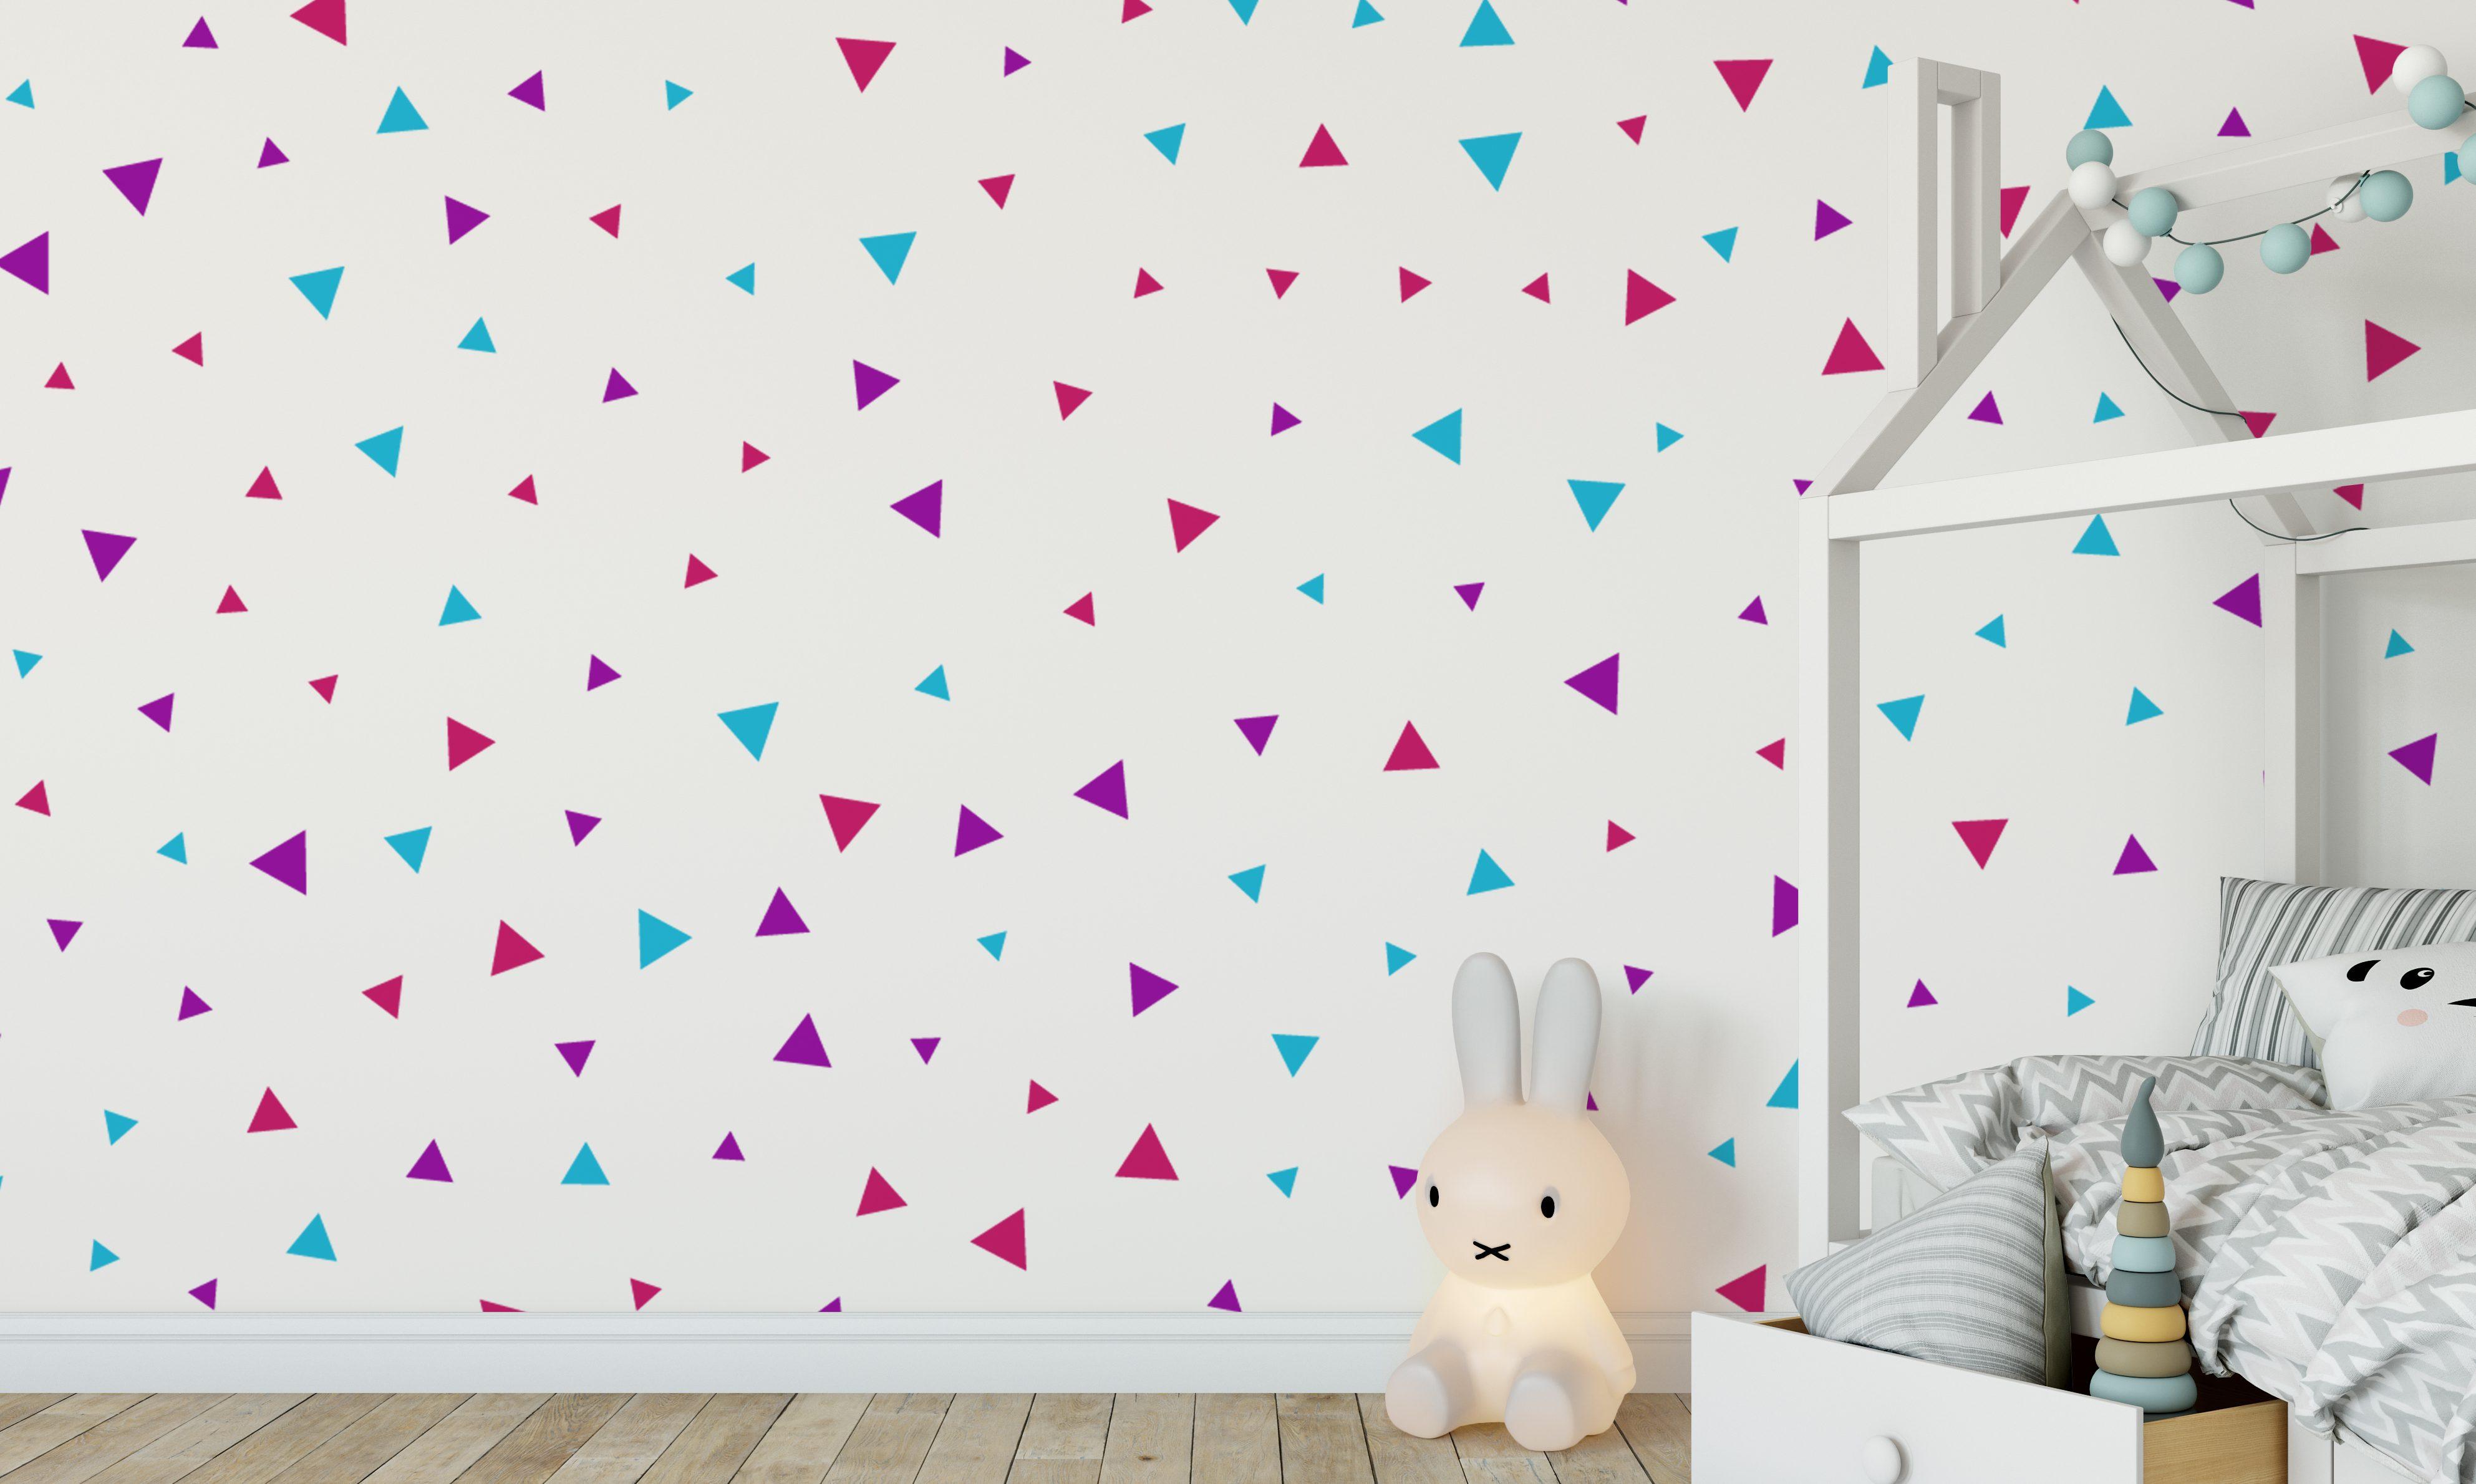 Triangle wall stickers trendy nursery ideas colourful wall triangle wall stickers amipublicfo Gallery